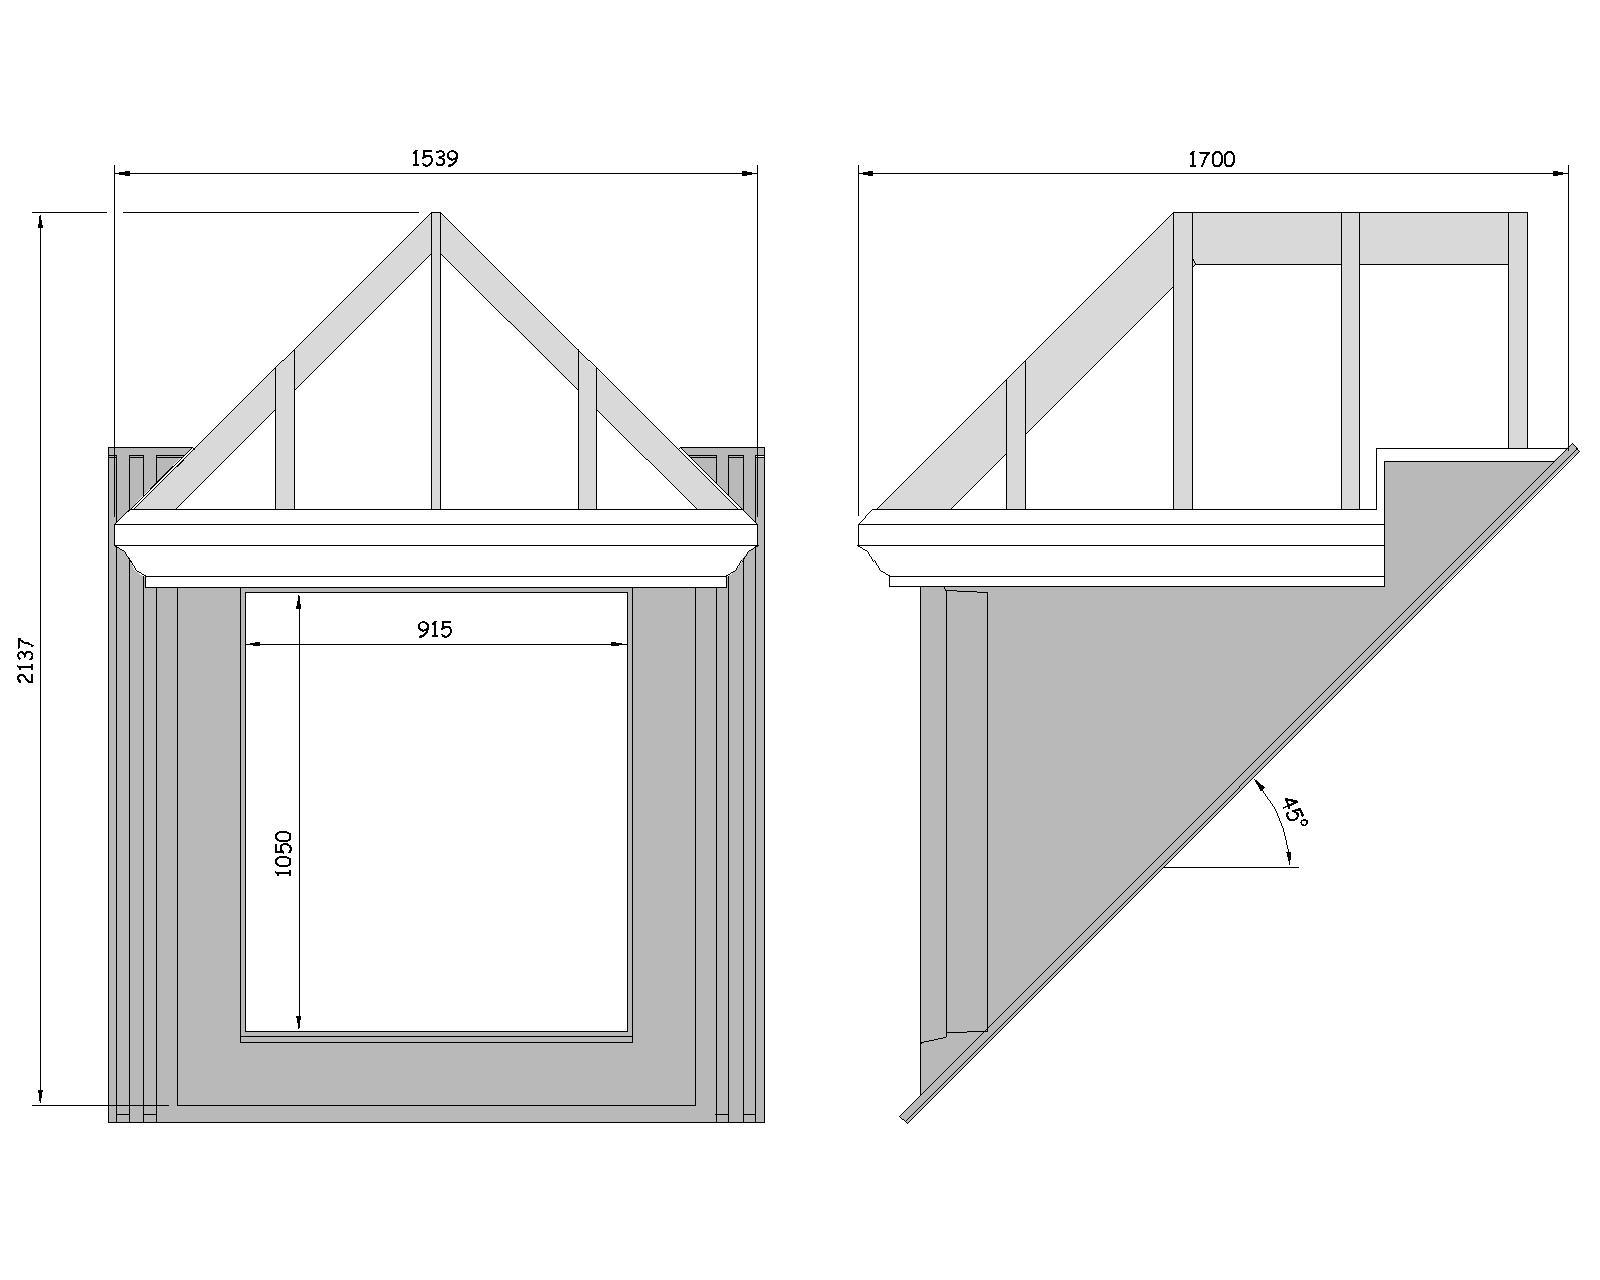 Fibreglass grp dormer trussed roof dormers uk for Dormer window construction drawings